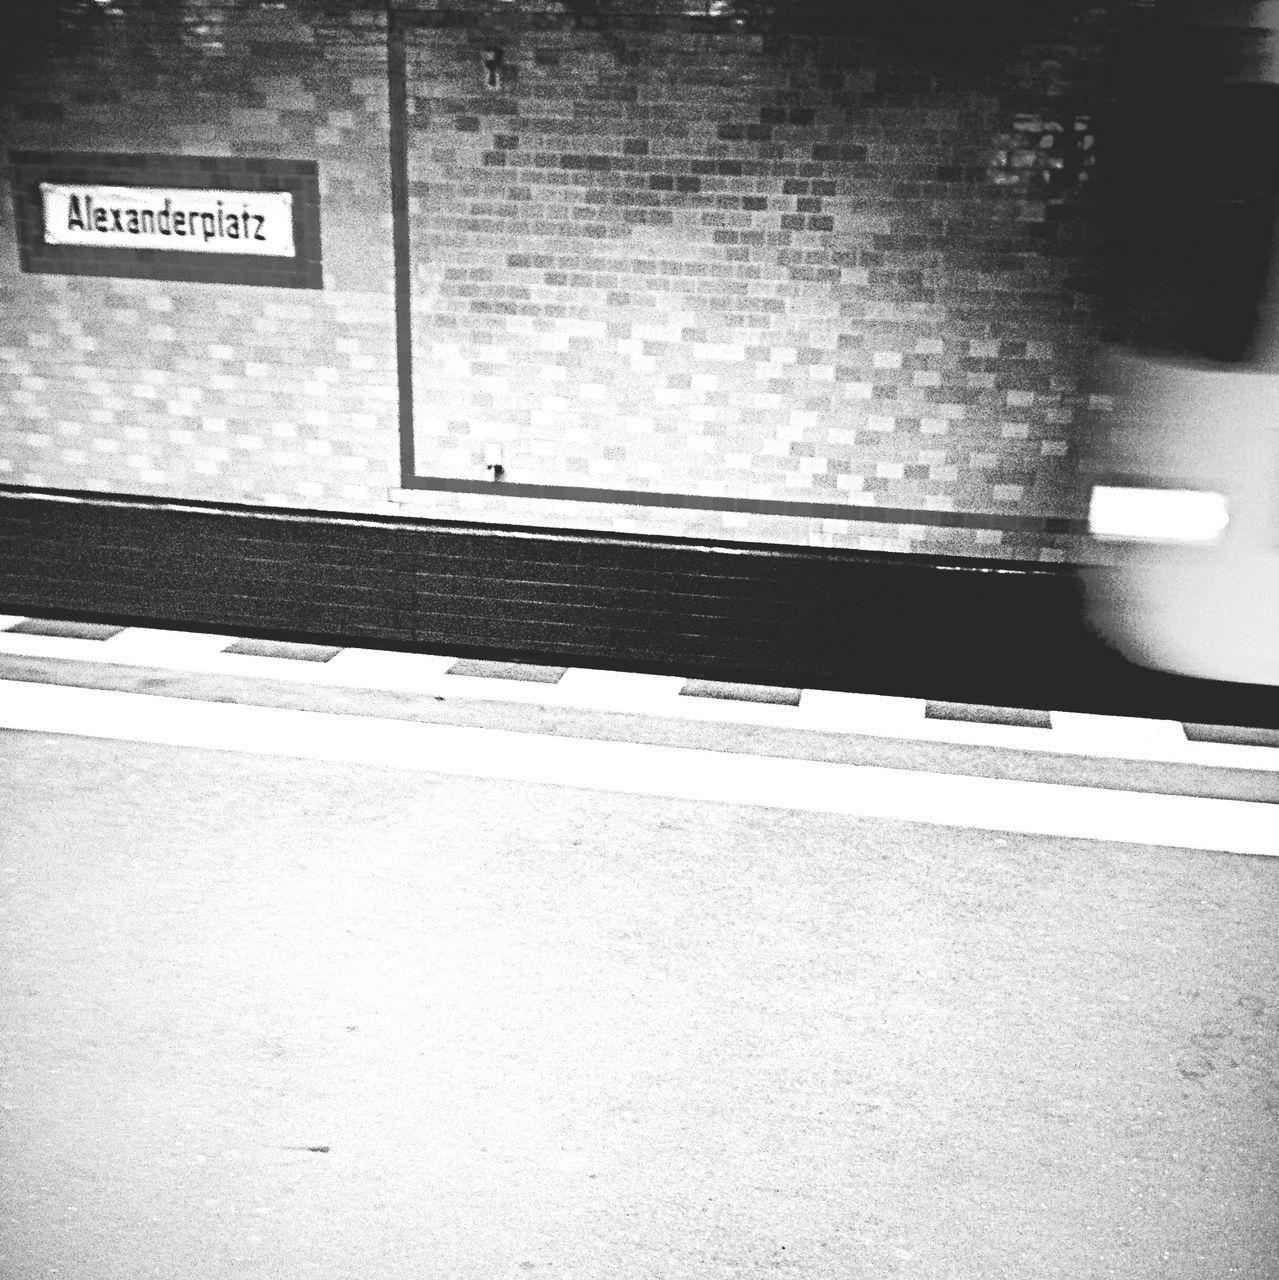 transportation, communication, text, public transportation, guidance, indoors, railroad station, rail transportation, no people, illuminated, day, architecture